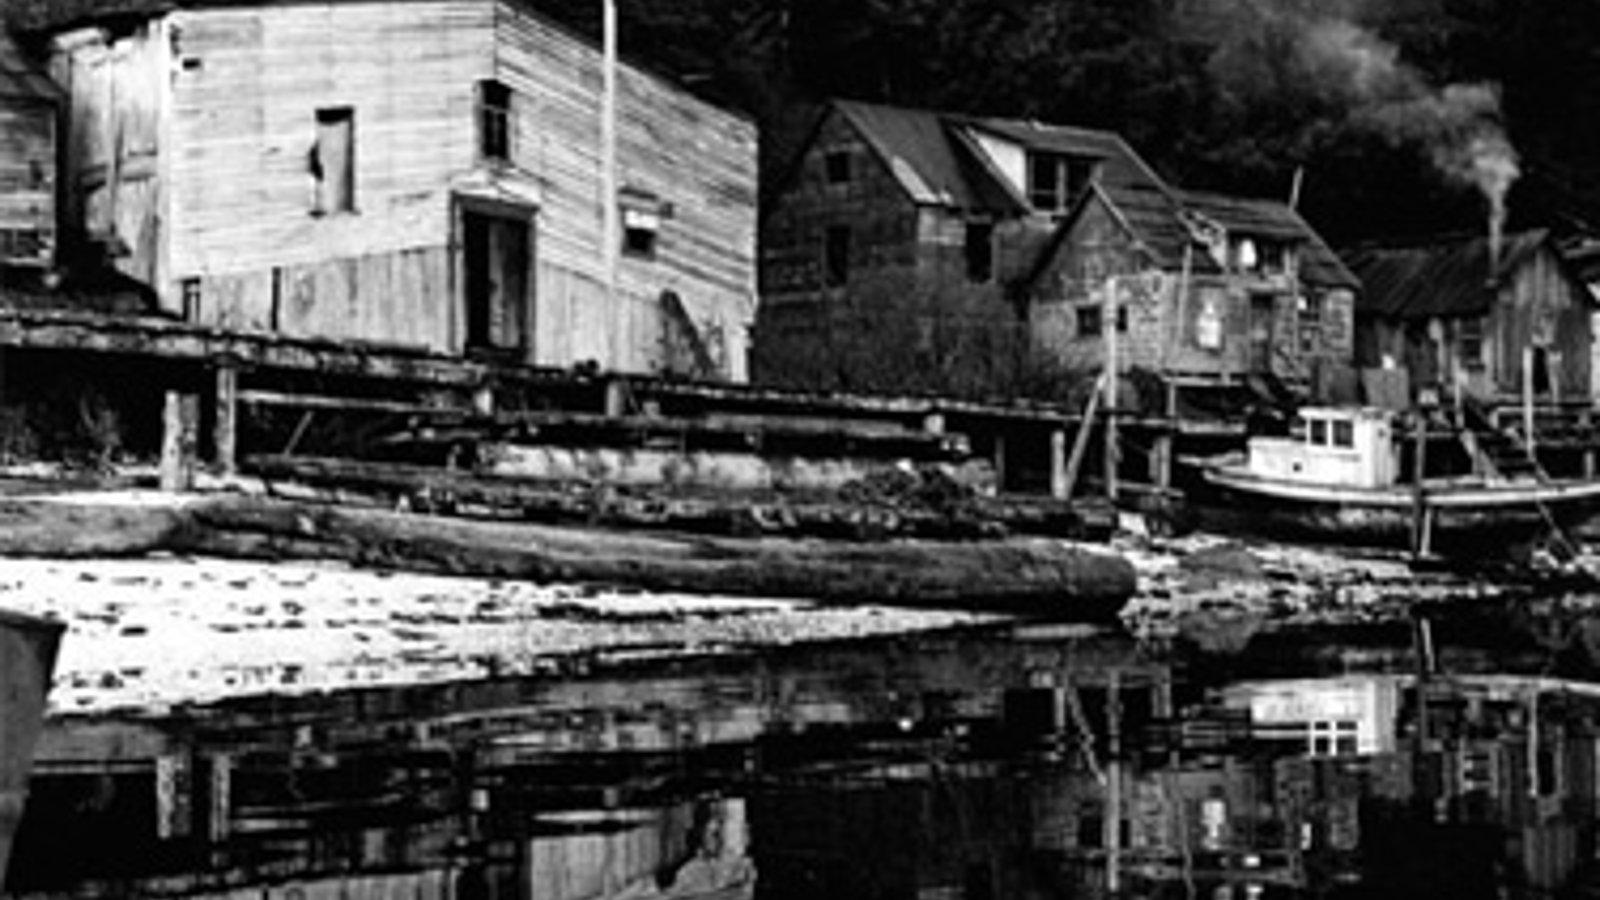 Blunden Harbour - The Kwakiutl Indians